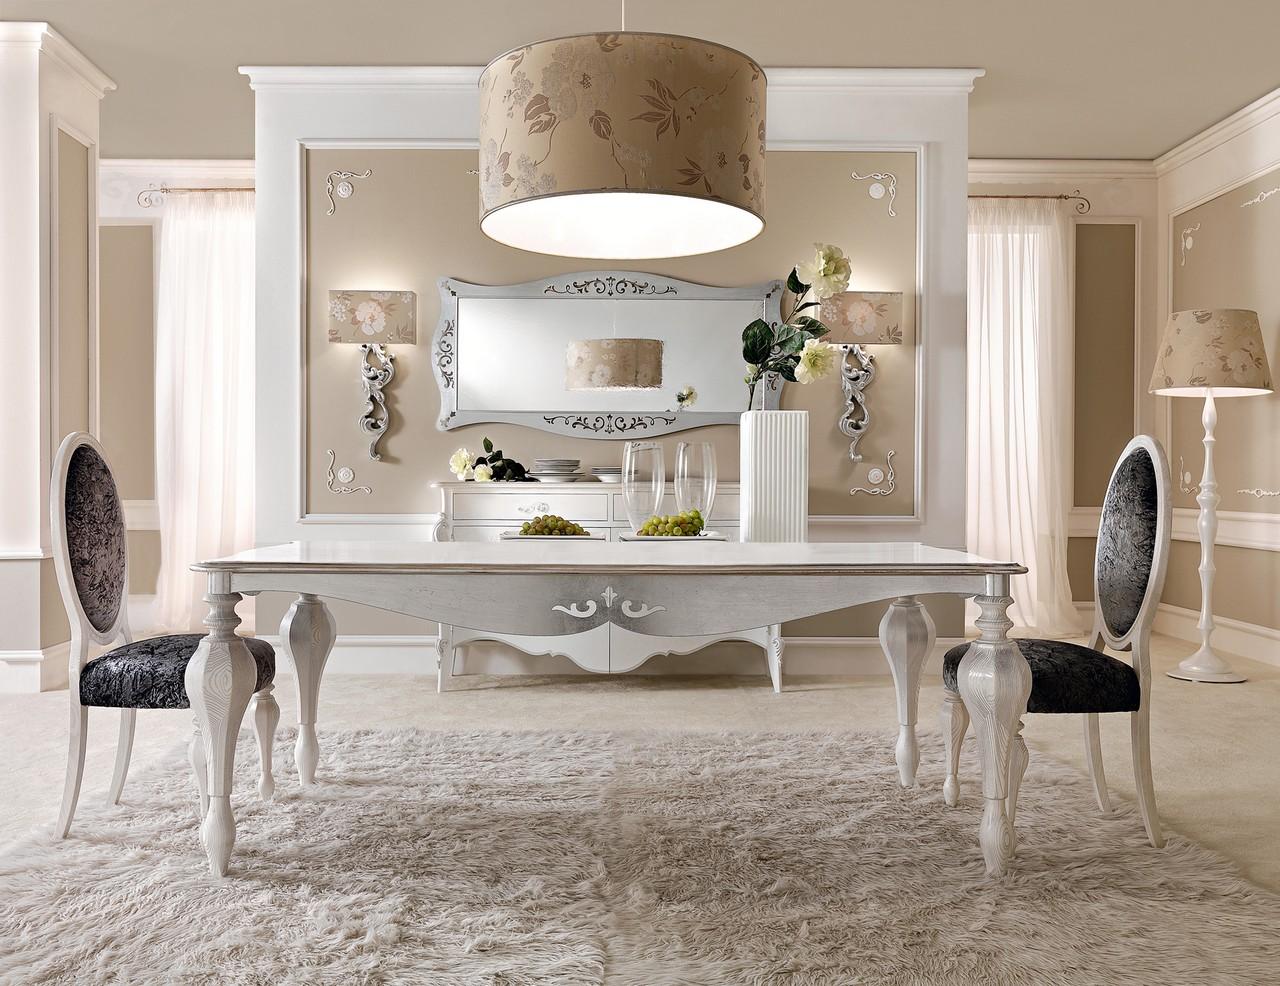 Gotha italian luxury stylescenario for Mobili italy